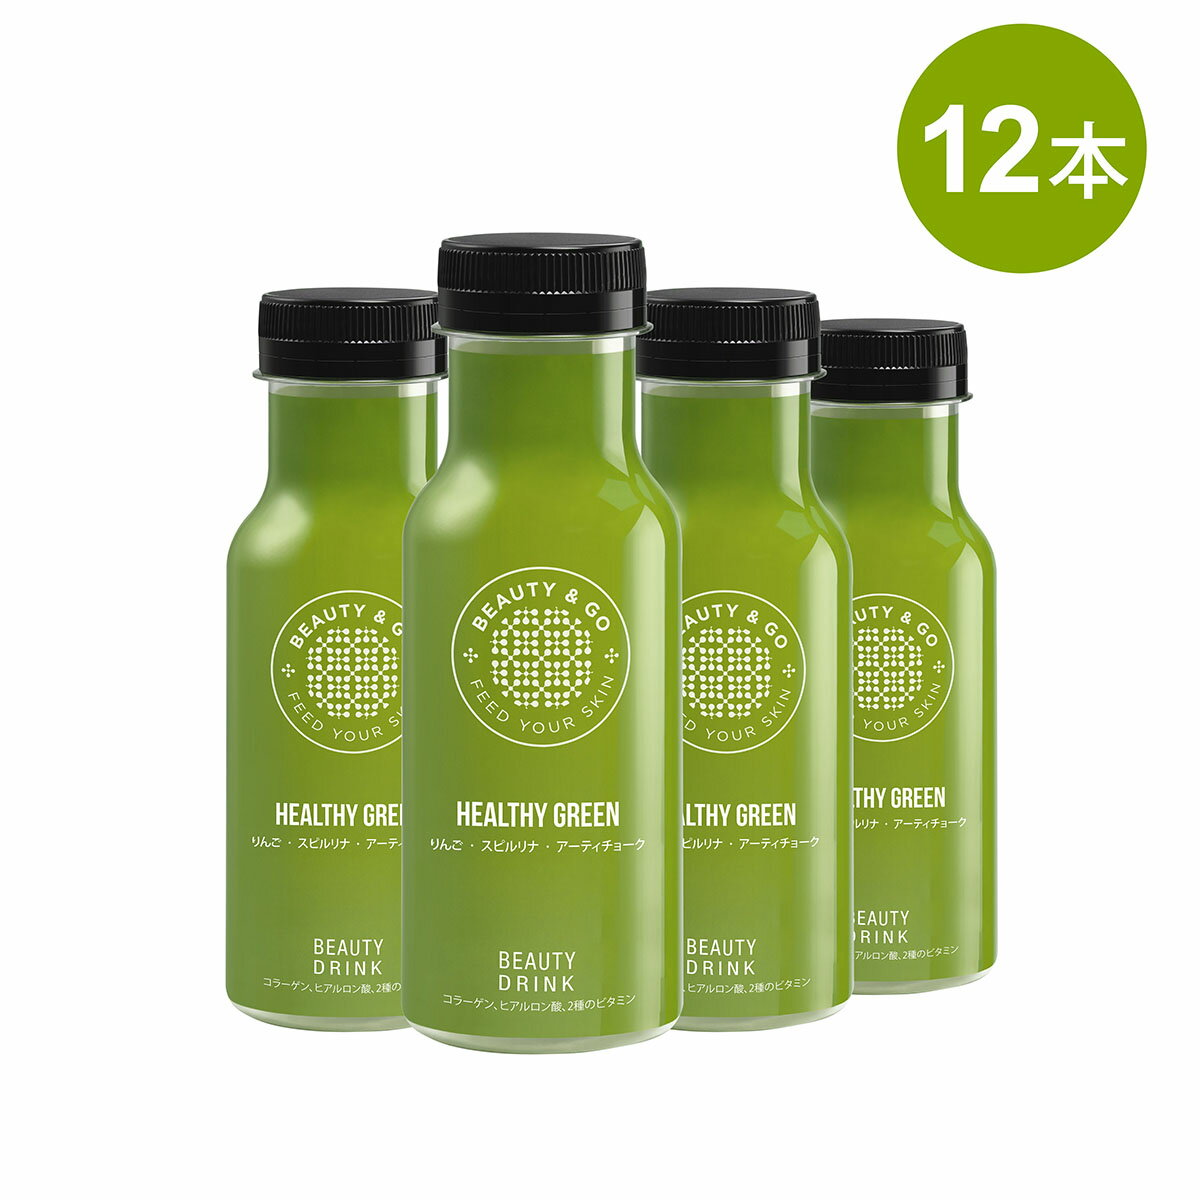 BEAUTY&GO HEALTHY GREEN (ヘルシーグリーン) 美容ドリンク ― 7日間のケア (12本)